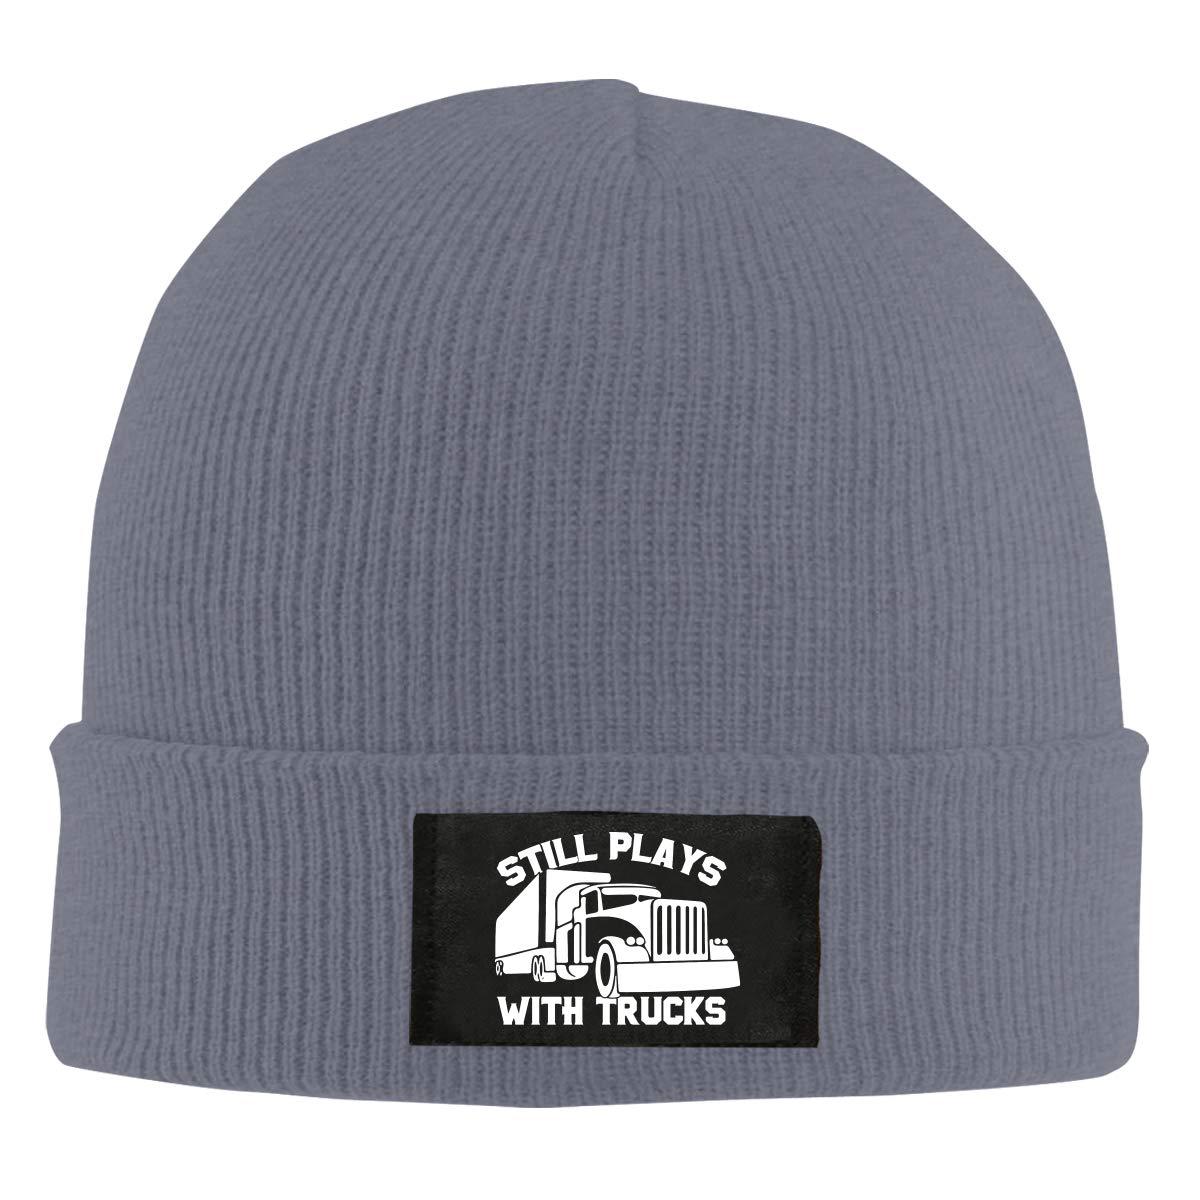 Still Plays with Trucks Truckers Unisex Warm Winter Hat Knit Beanie Skull Cap Cuff Beanie Hat Winter Hats